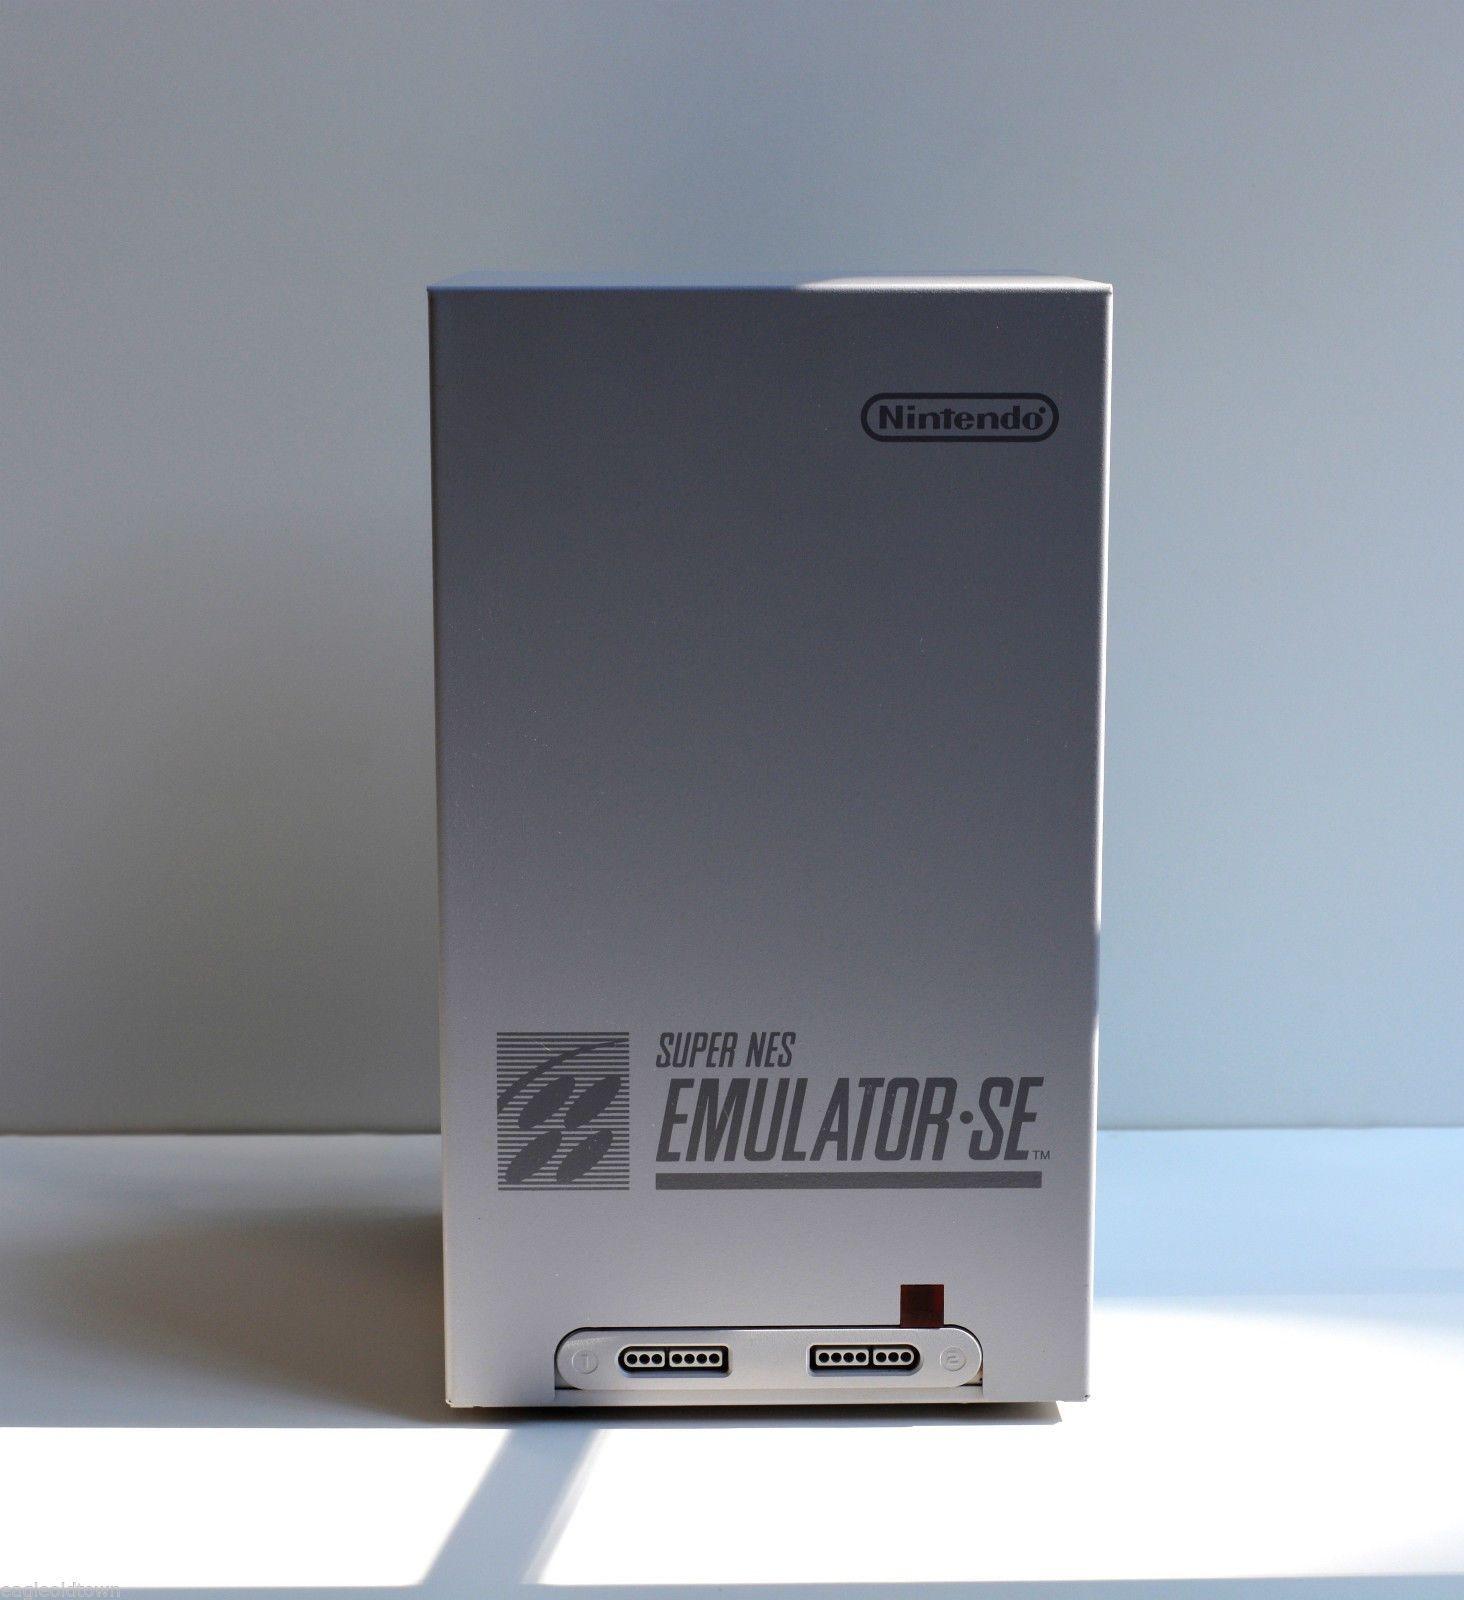 Super NES Emulator SE, the SNES Development kit